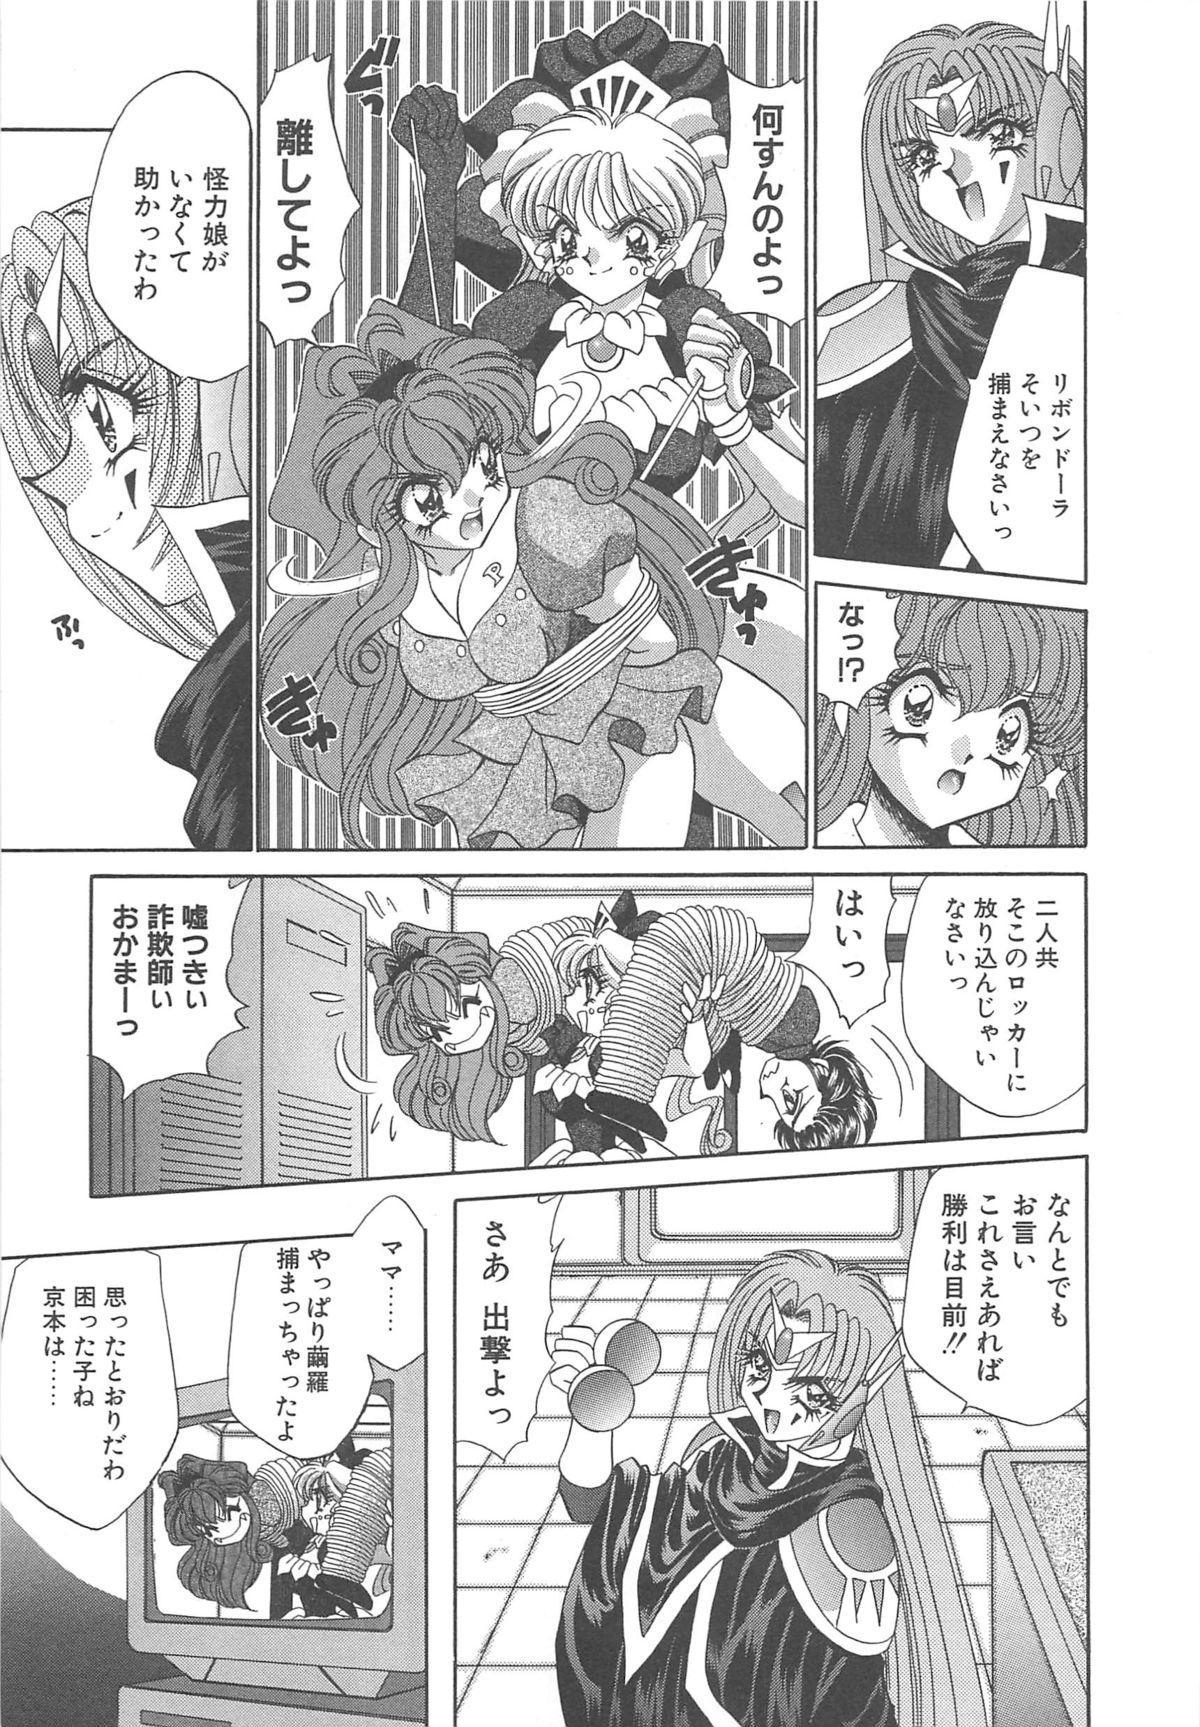 Kigurumi Sentai Quiltian 189